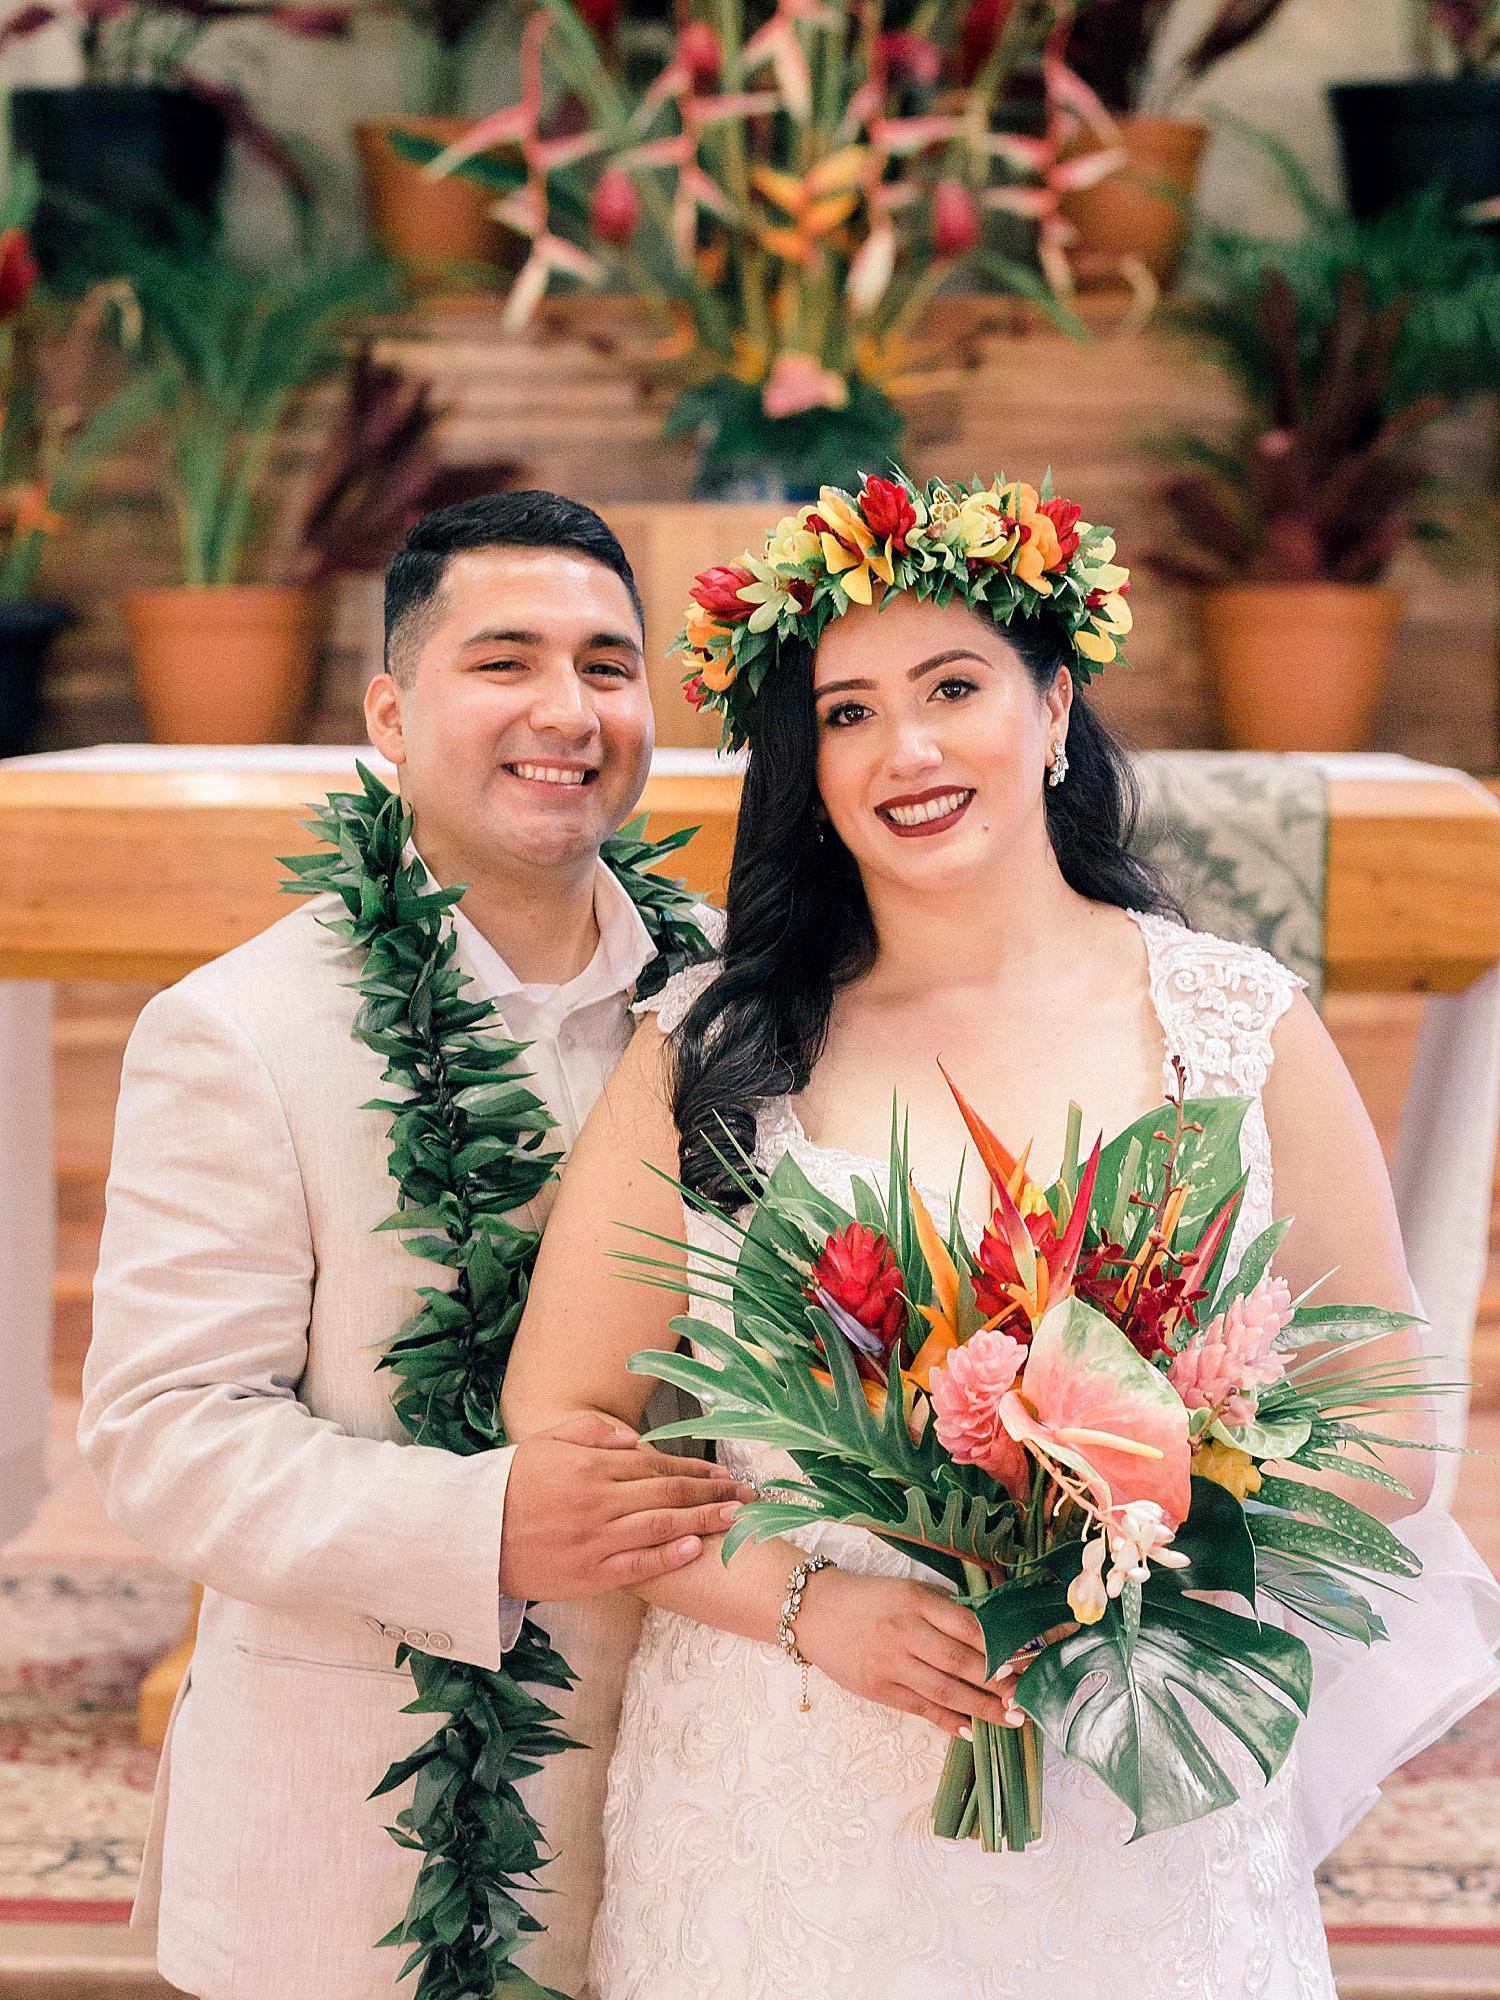 Maui-Wedding-Bride-and-Groom-Portraits-Launiupoko-Beach_0003.jpg